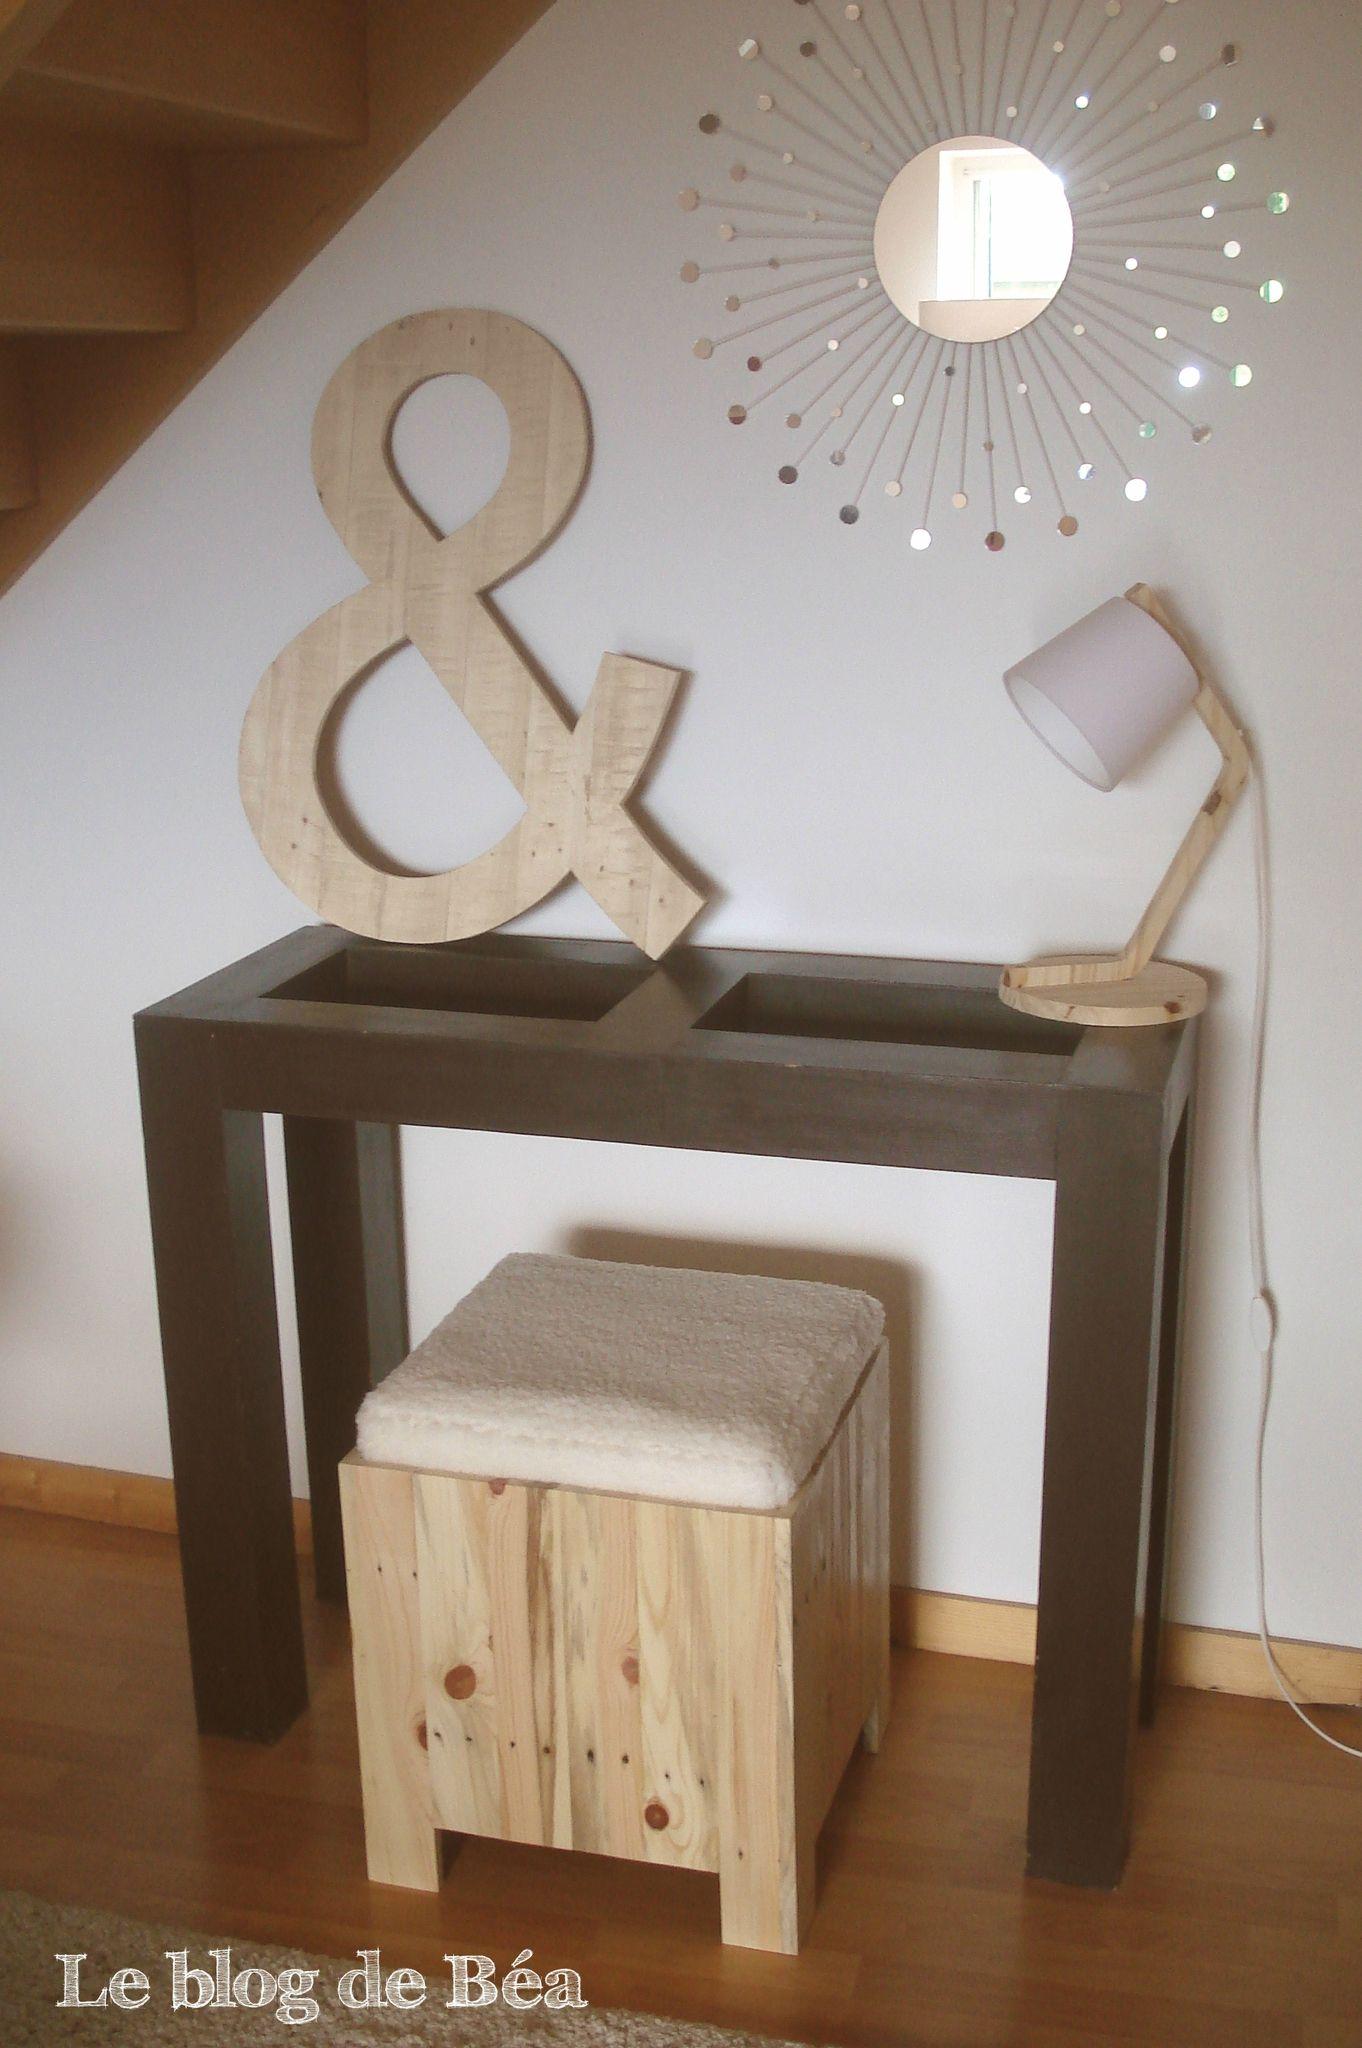 7eae27bb45e464cacbba467508d54b0e Luxe De Table Basse Palette Verre Concept